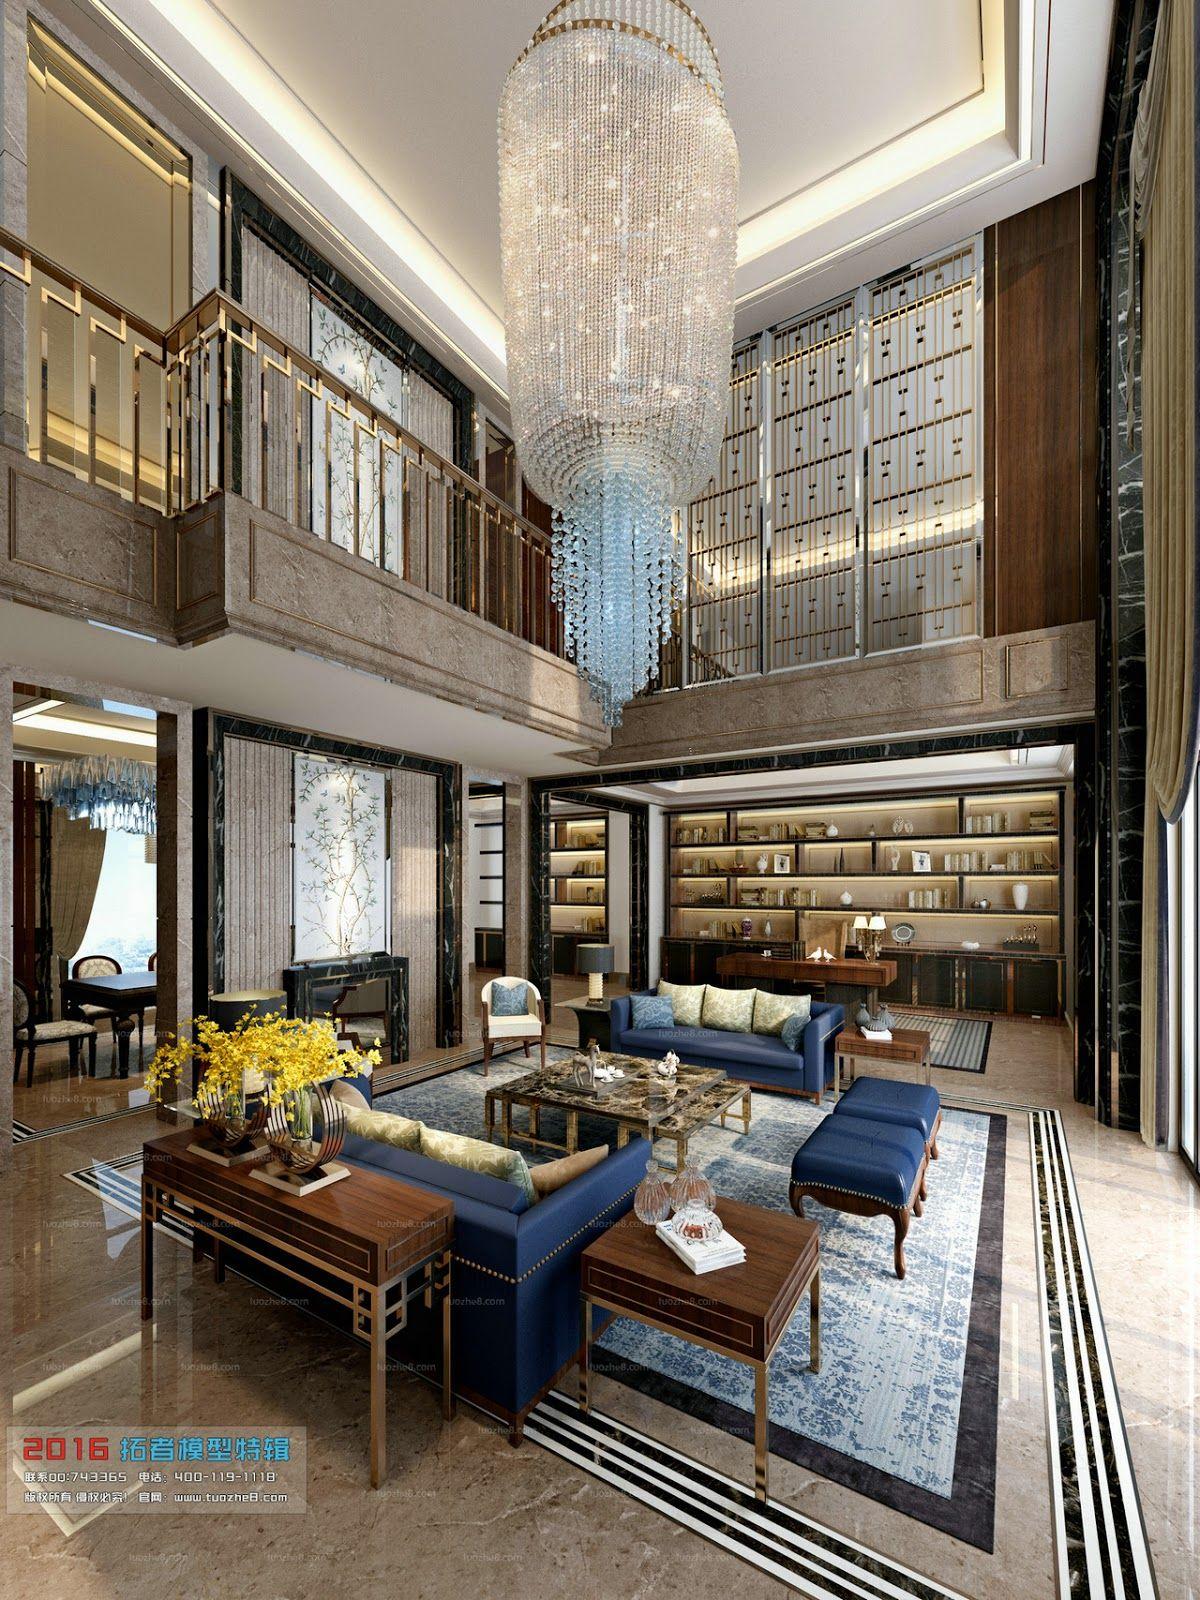 3d Room Interior Design: M039 – EXTENSION 2016 = 01. LIVINGROOM: MODERN SPACE